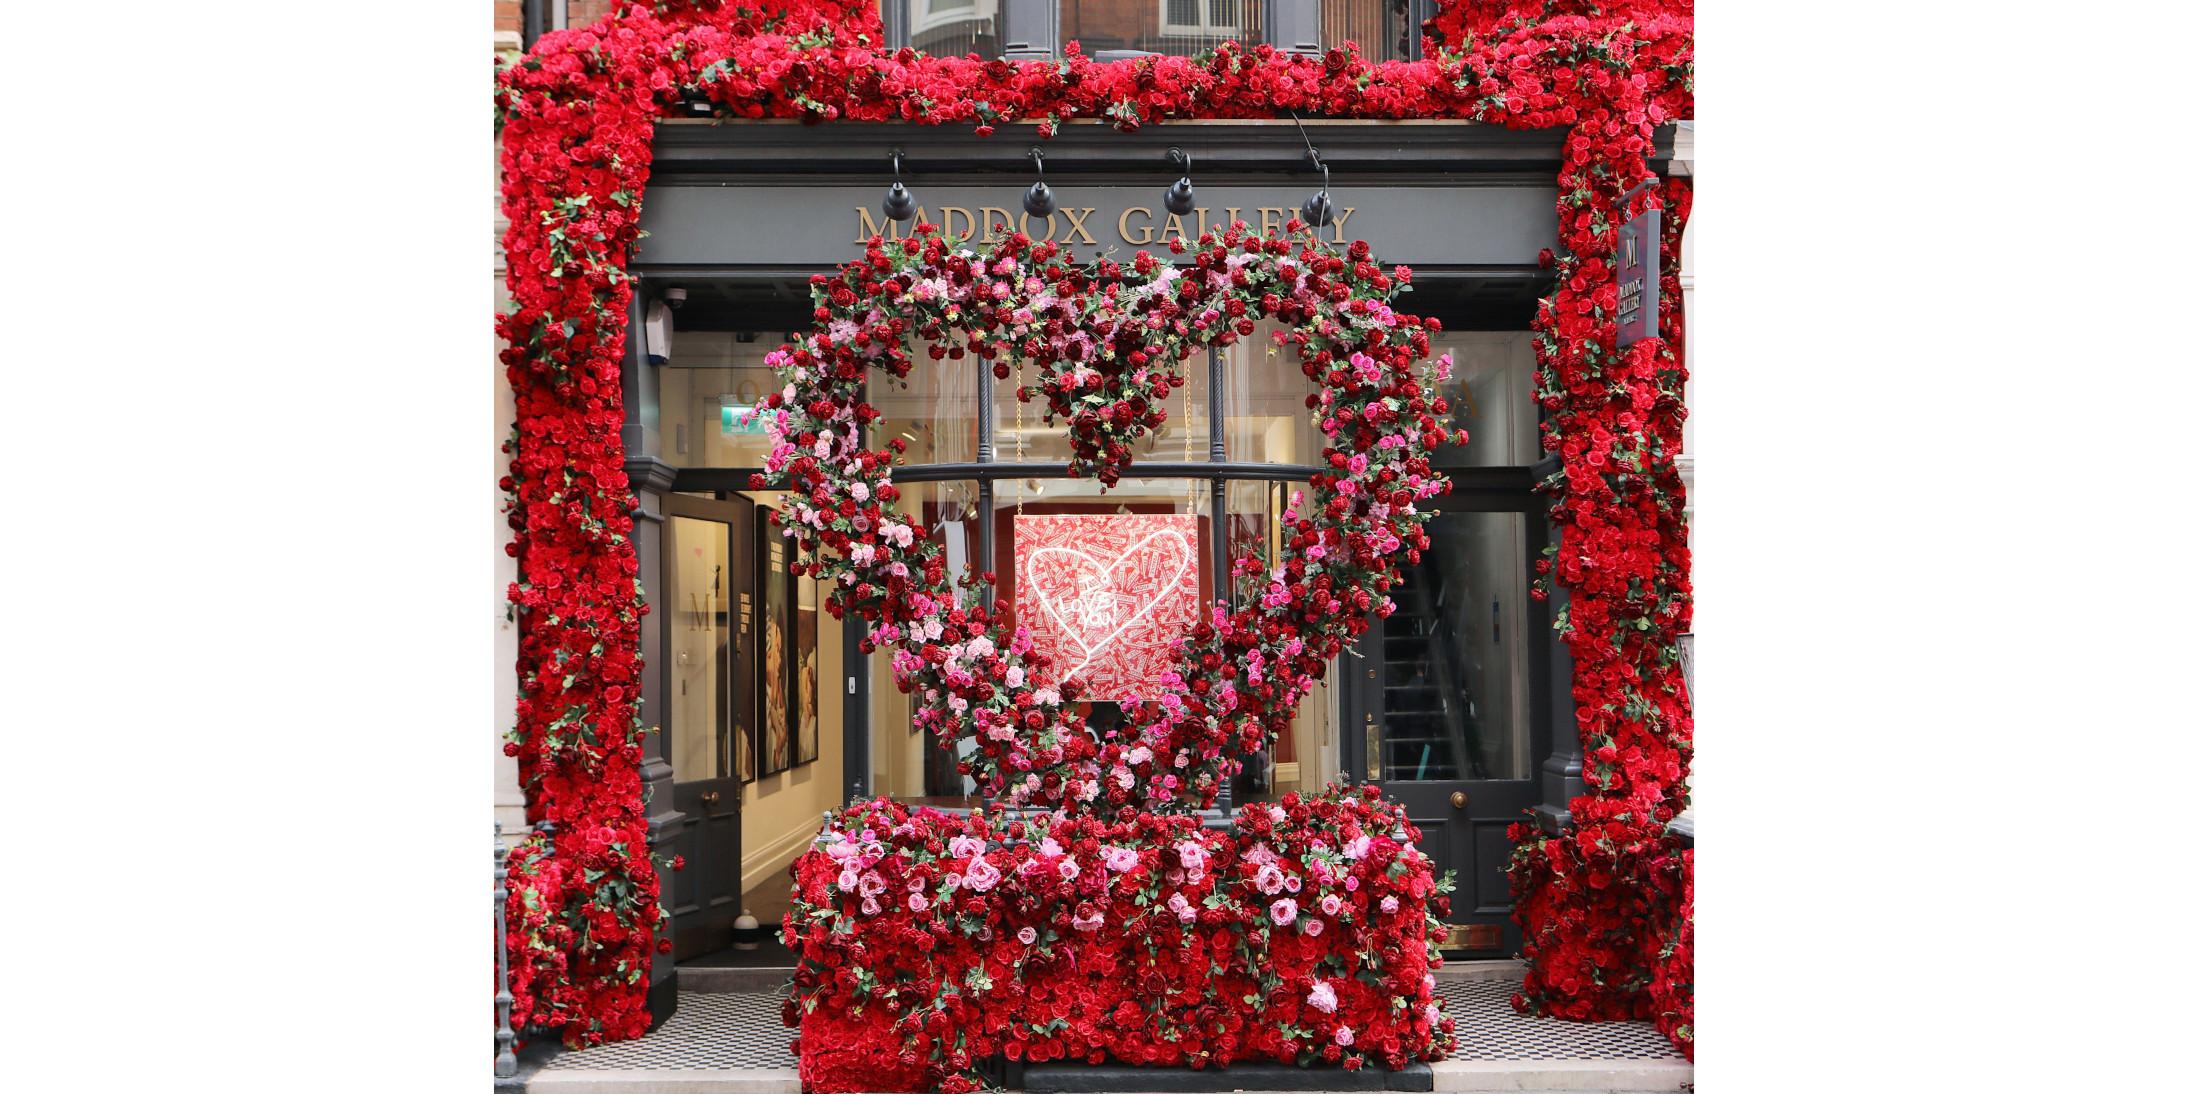 Maddox Gallery Mayfair London